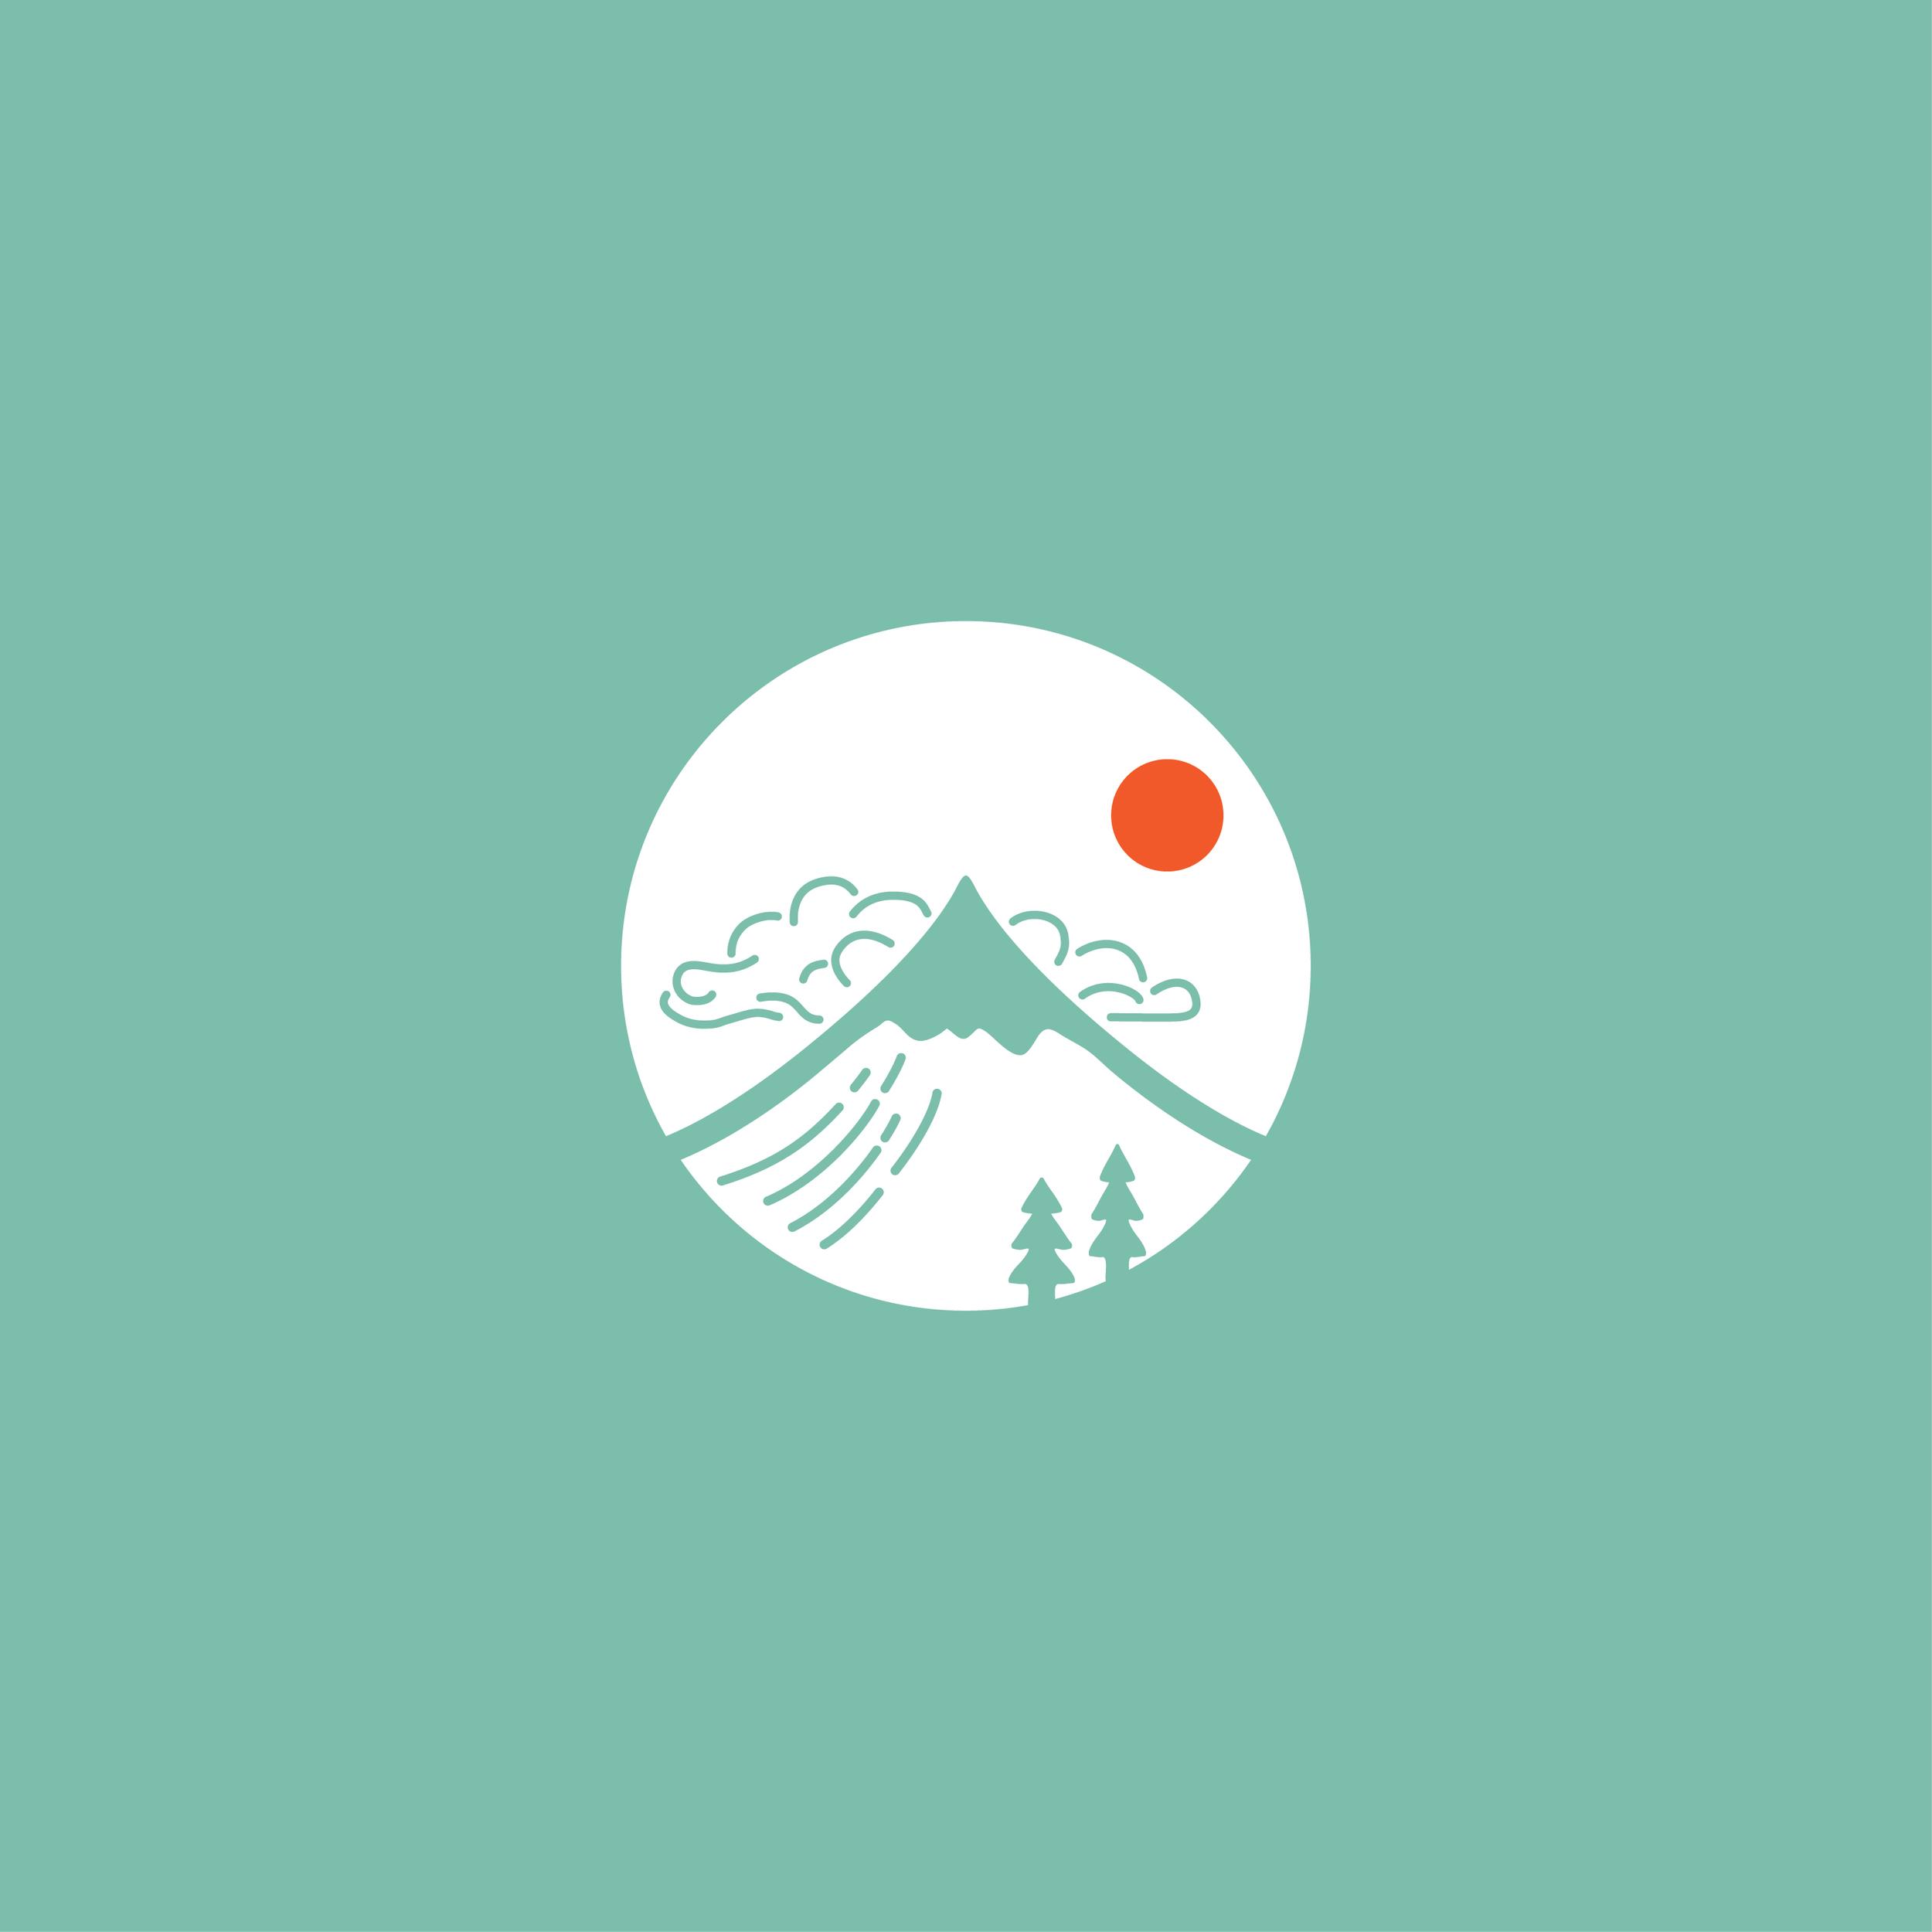 designs for fun-02.jpg